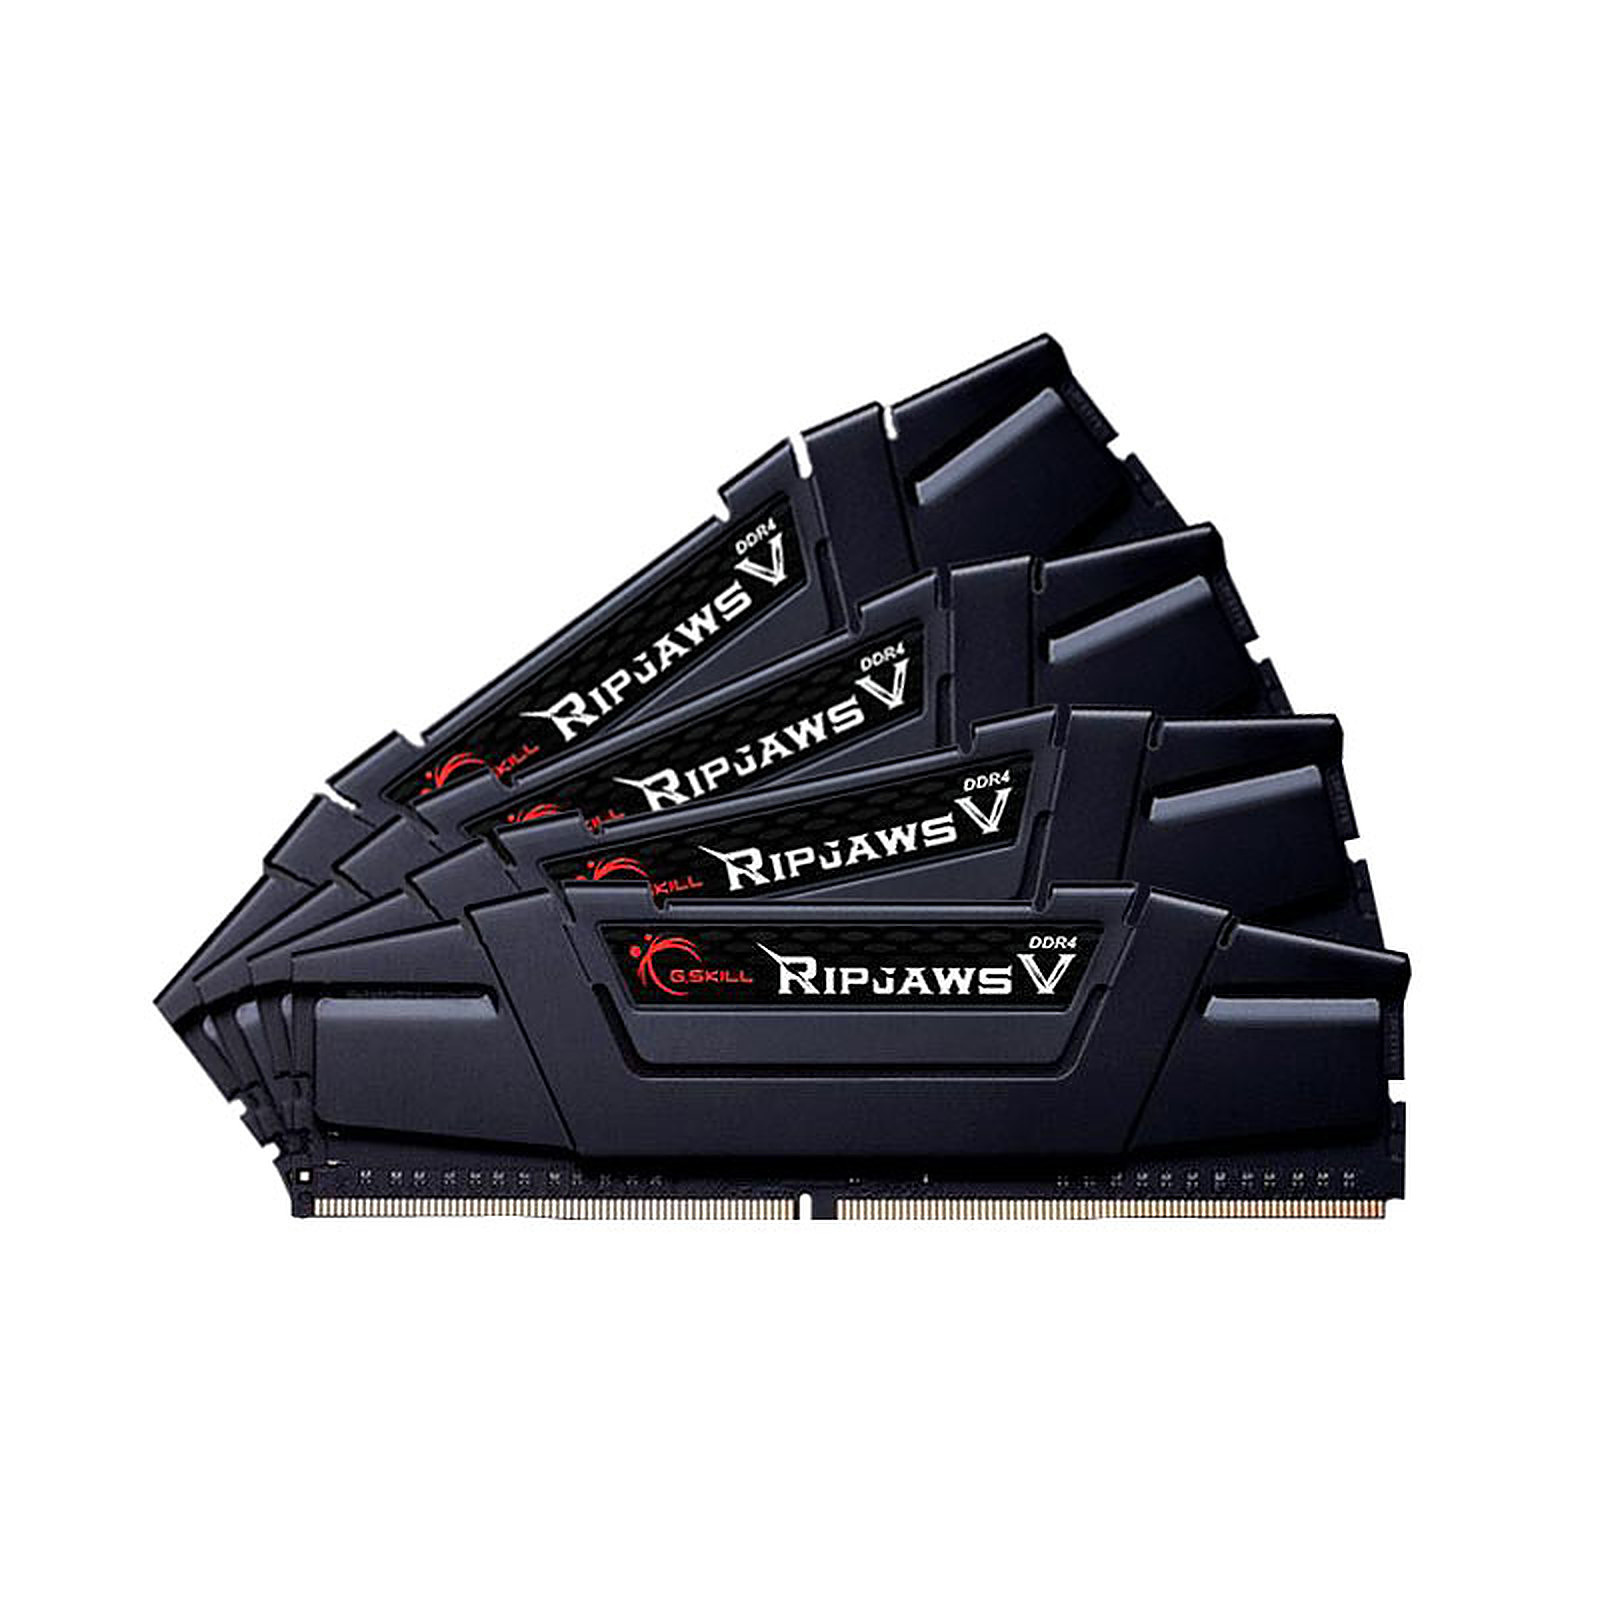 G.Skill RipJaws 5 Series Noir 32 Go (4 x 8 Go) DDR4 4000 MHz CL18